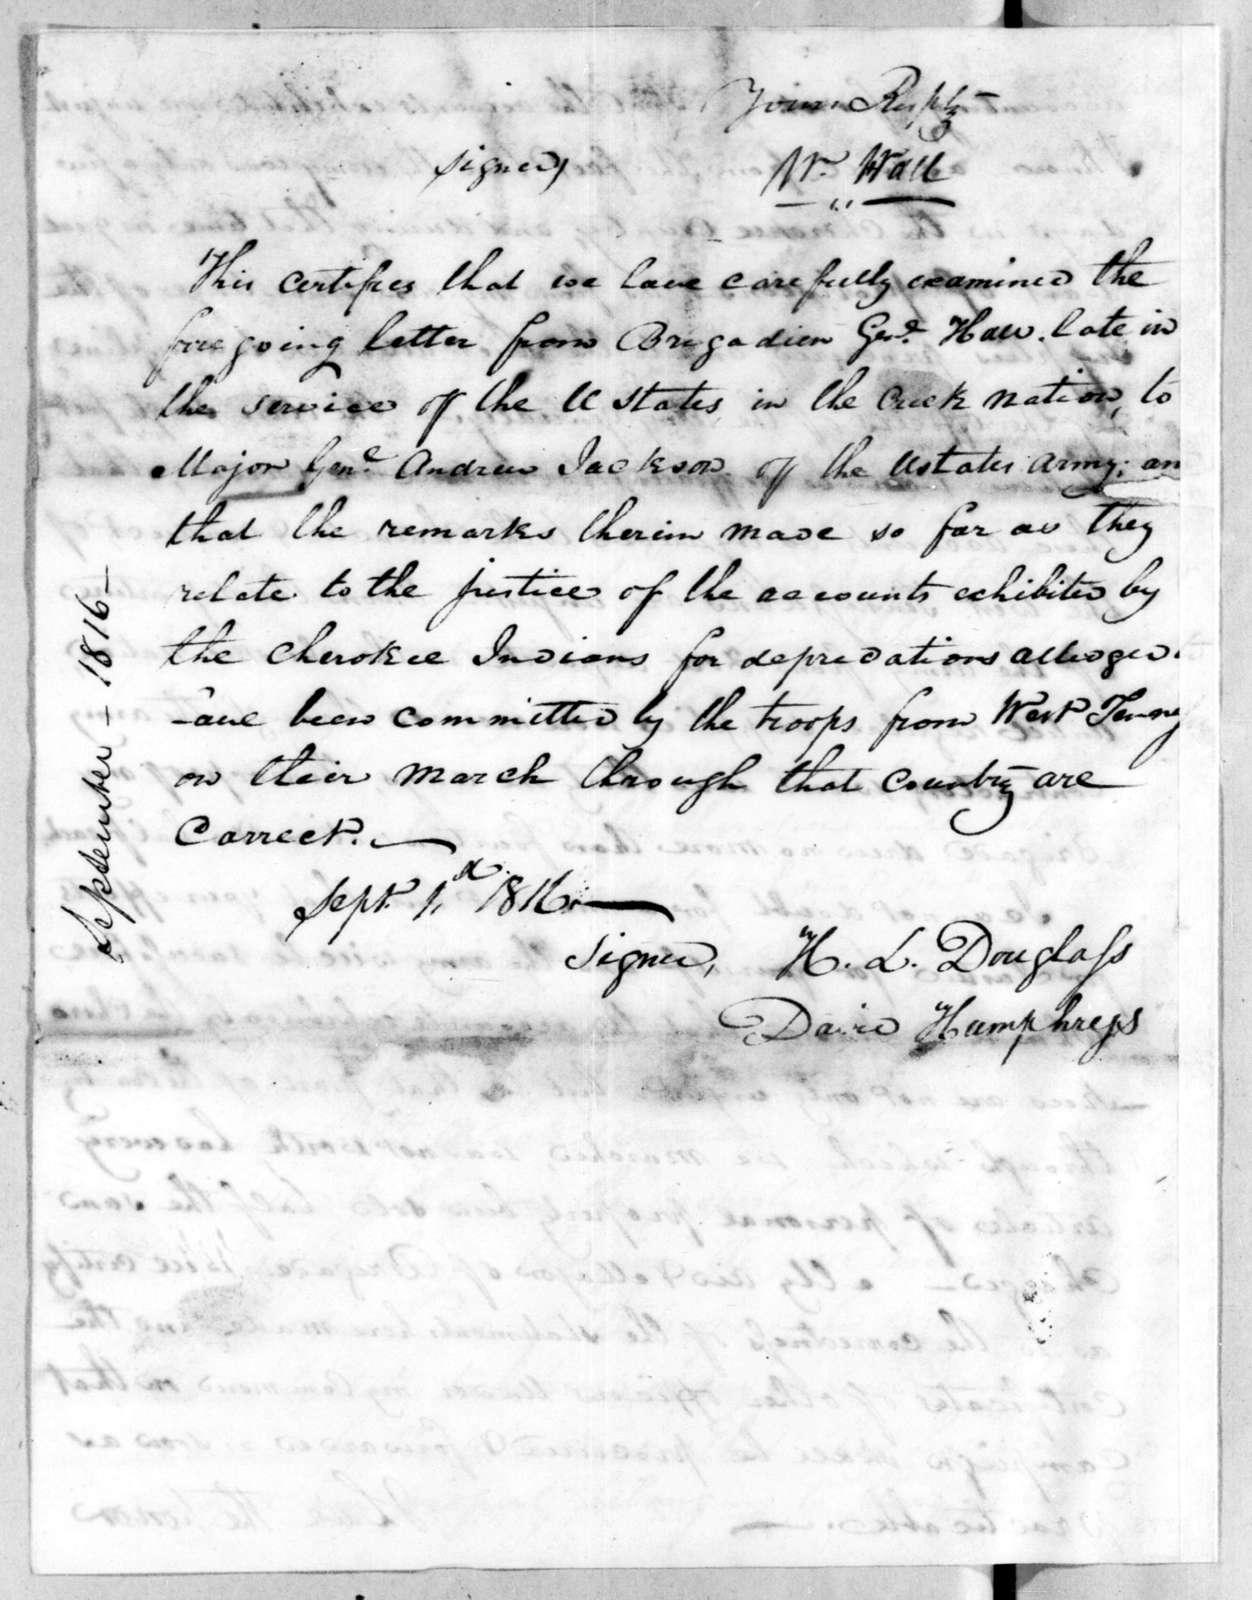 William Hall to Andrew Jackson, August 28, 1816